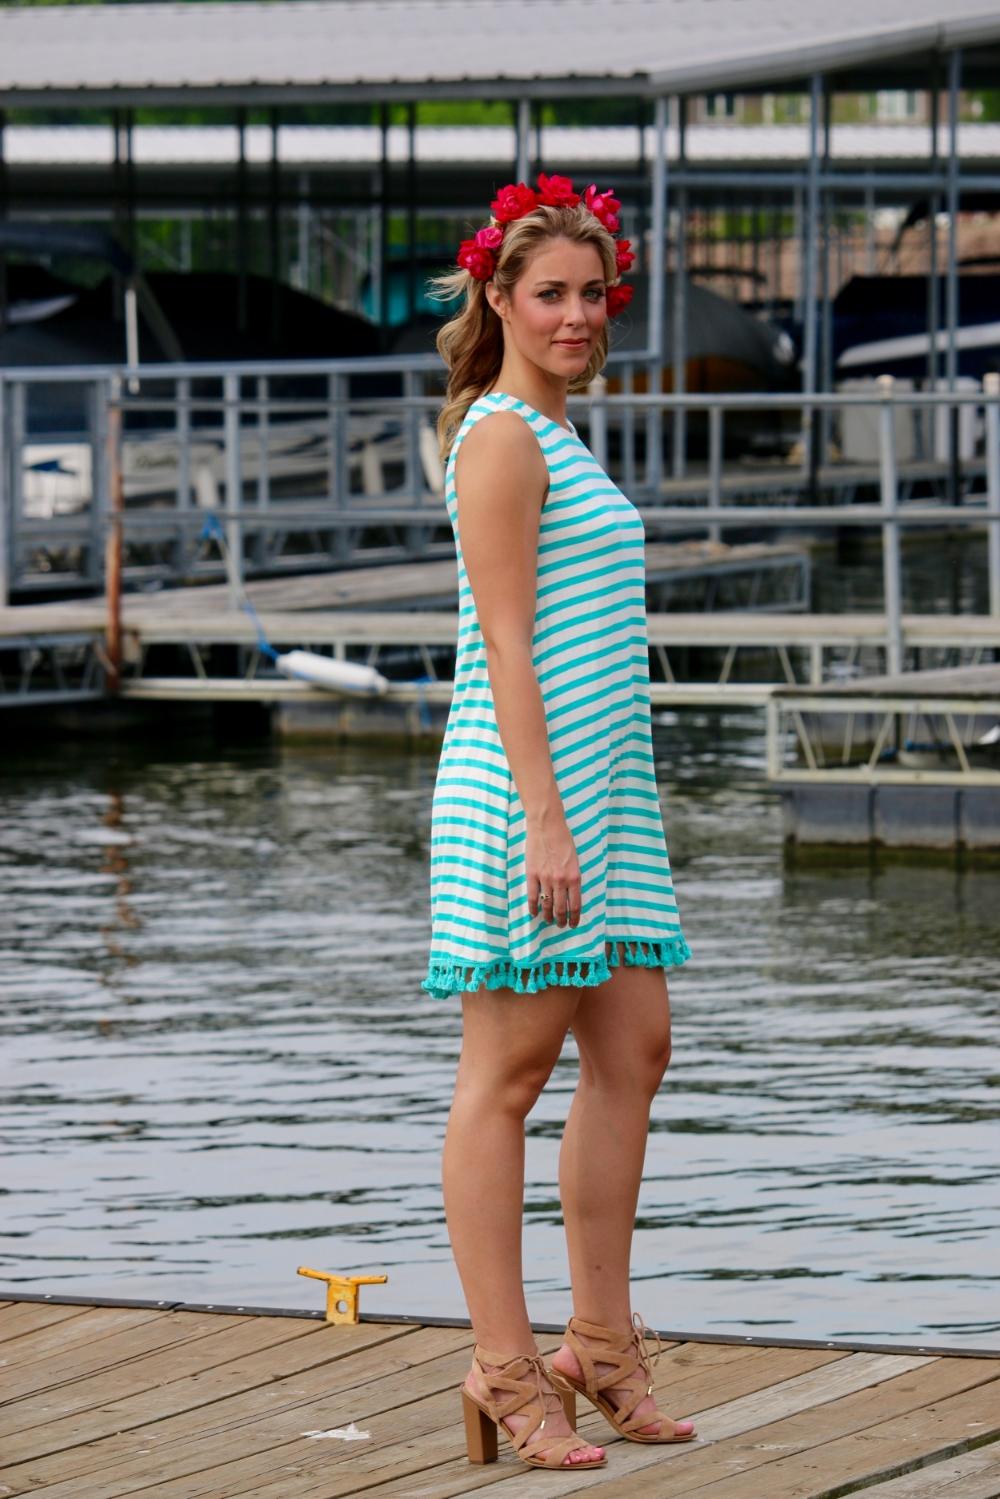 Hanging out on the docks at Lake Springfield Marina